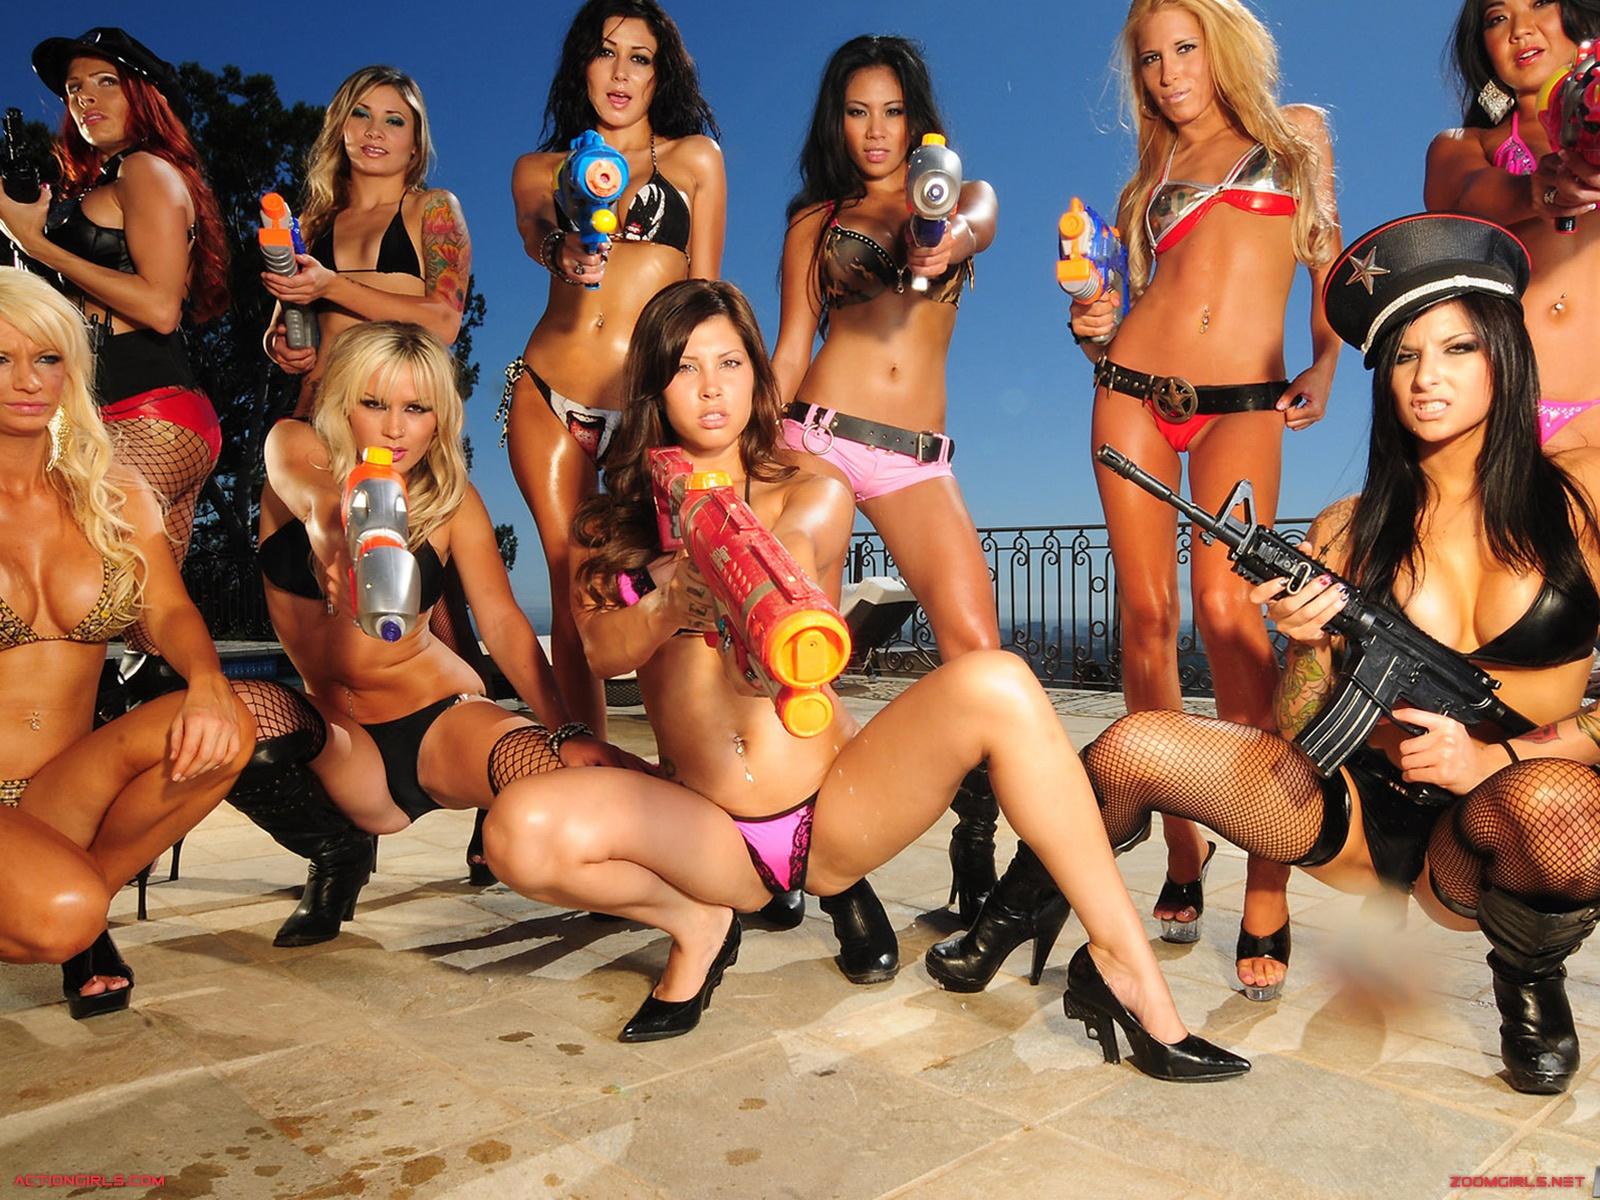 Girls with Guns | Euro Palace Casino Blog - Part 2